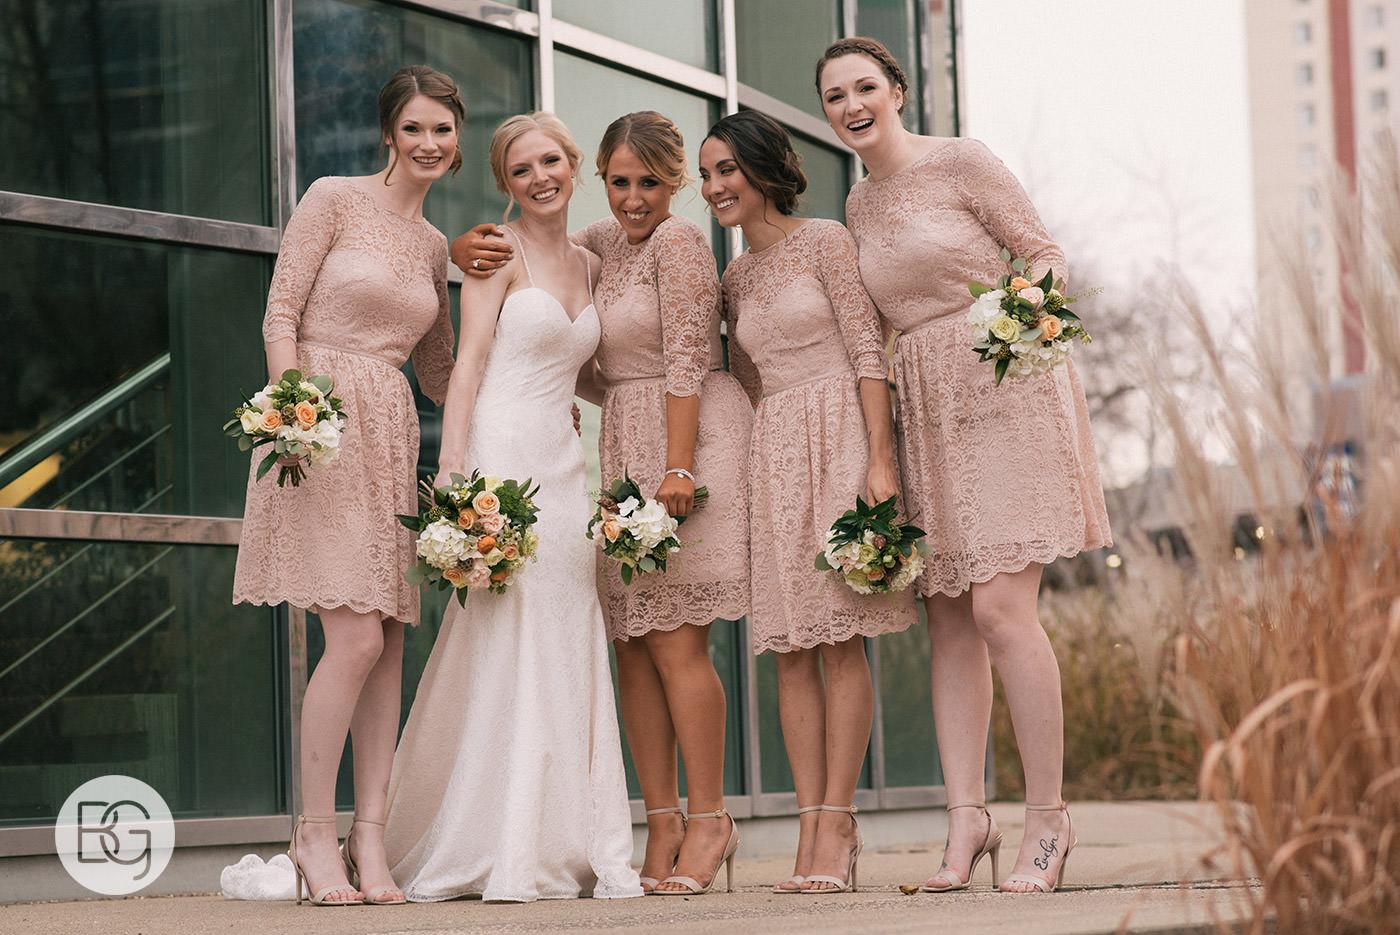 Edmonton_wedding_photographers_josh_sara_whyte_17.jpg